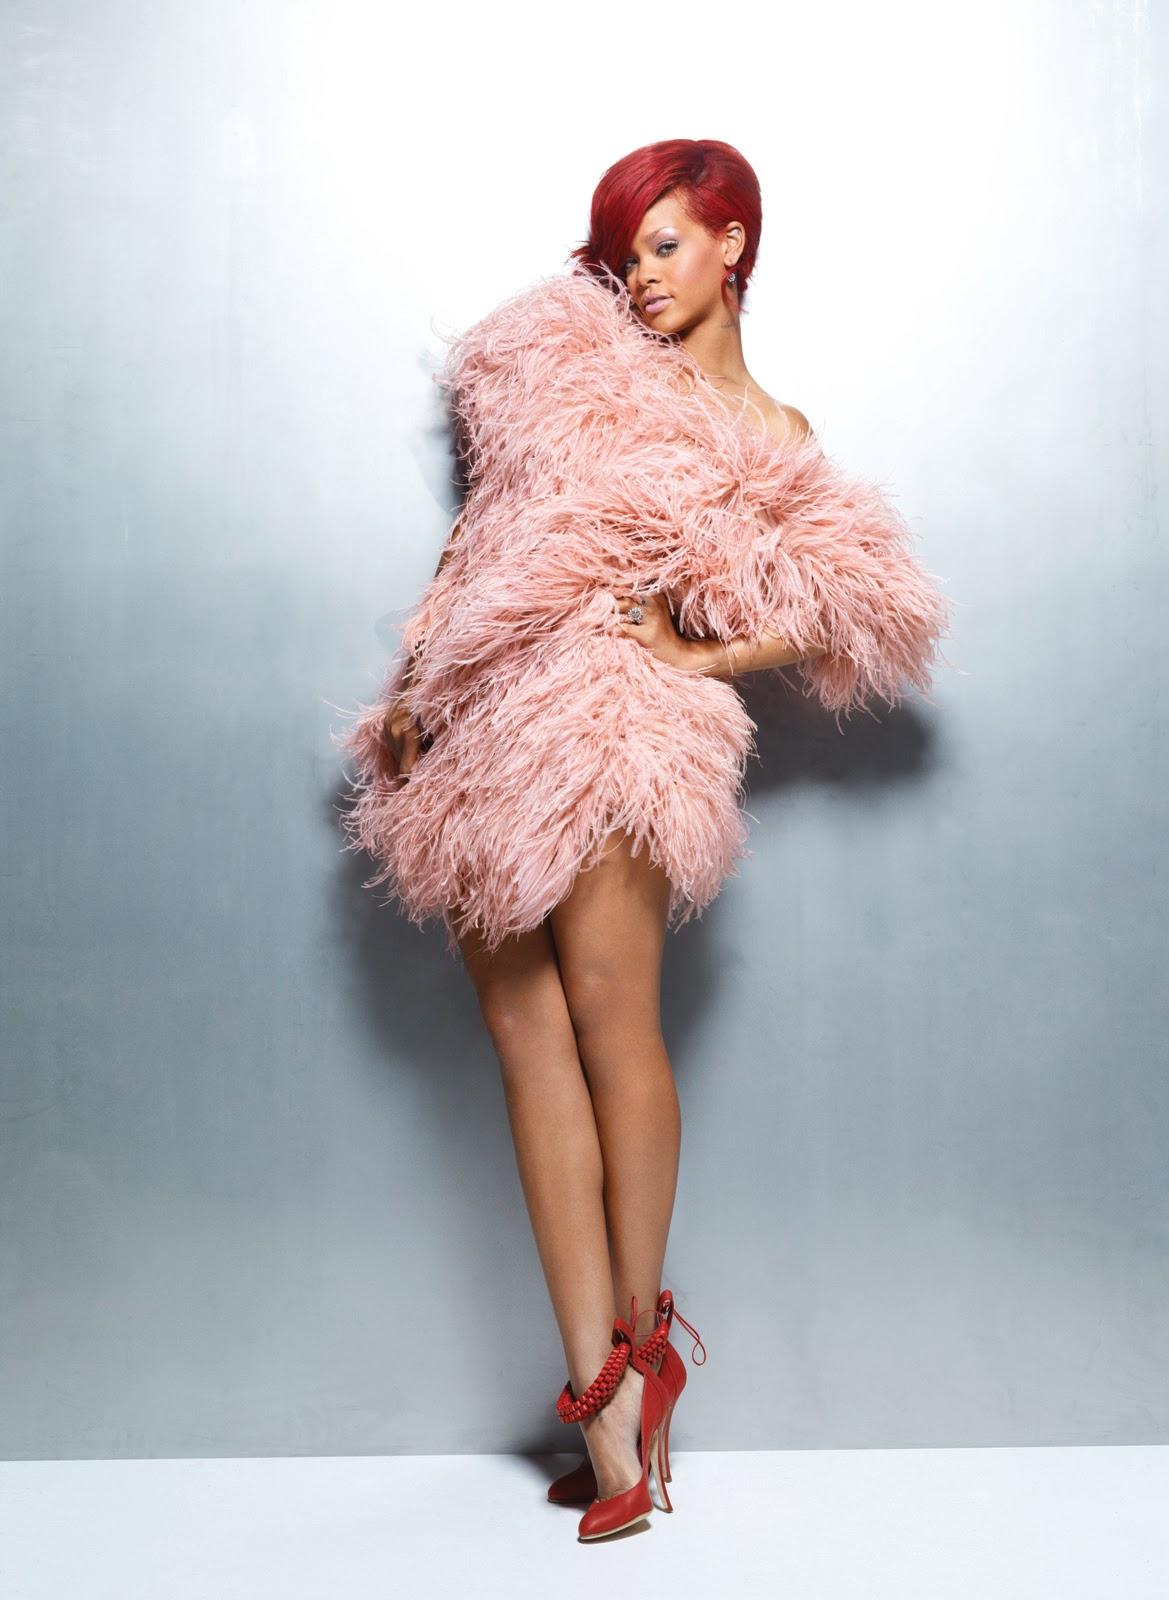 http://1.bp.blogspot.com/_c6MC1HN_BoI/TMwwo2DJp_I/AAAAAAAAAbw/gh-sVgDET2U/s1600/Rihanna+%2813%29.jpg